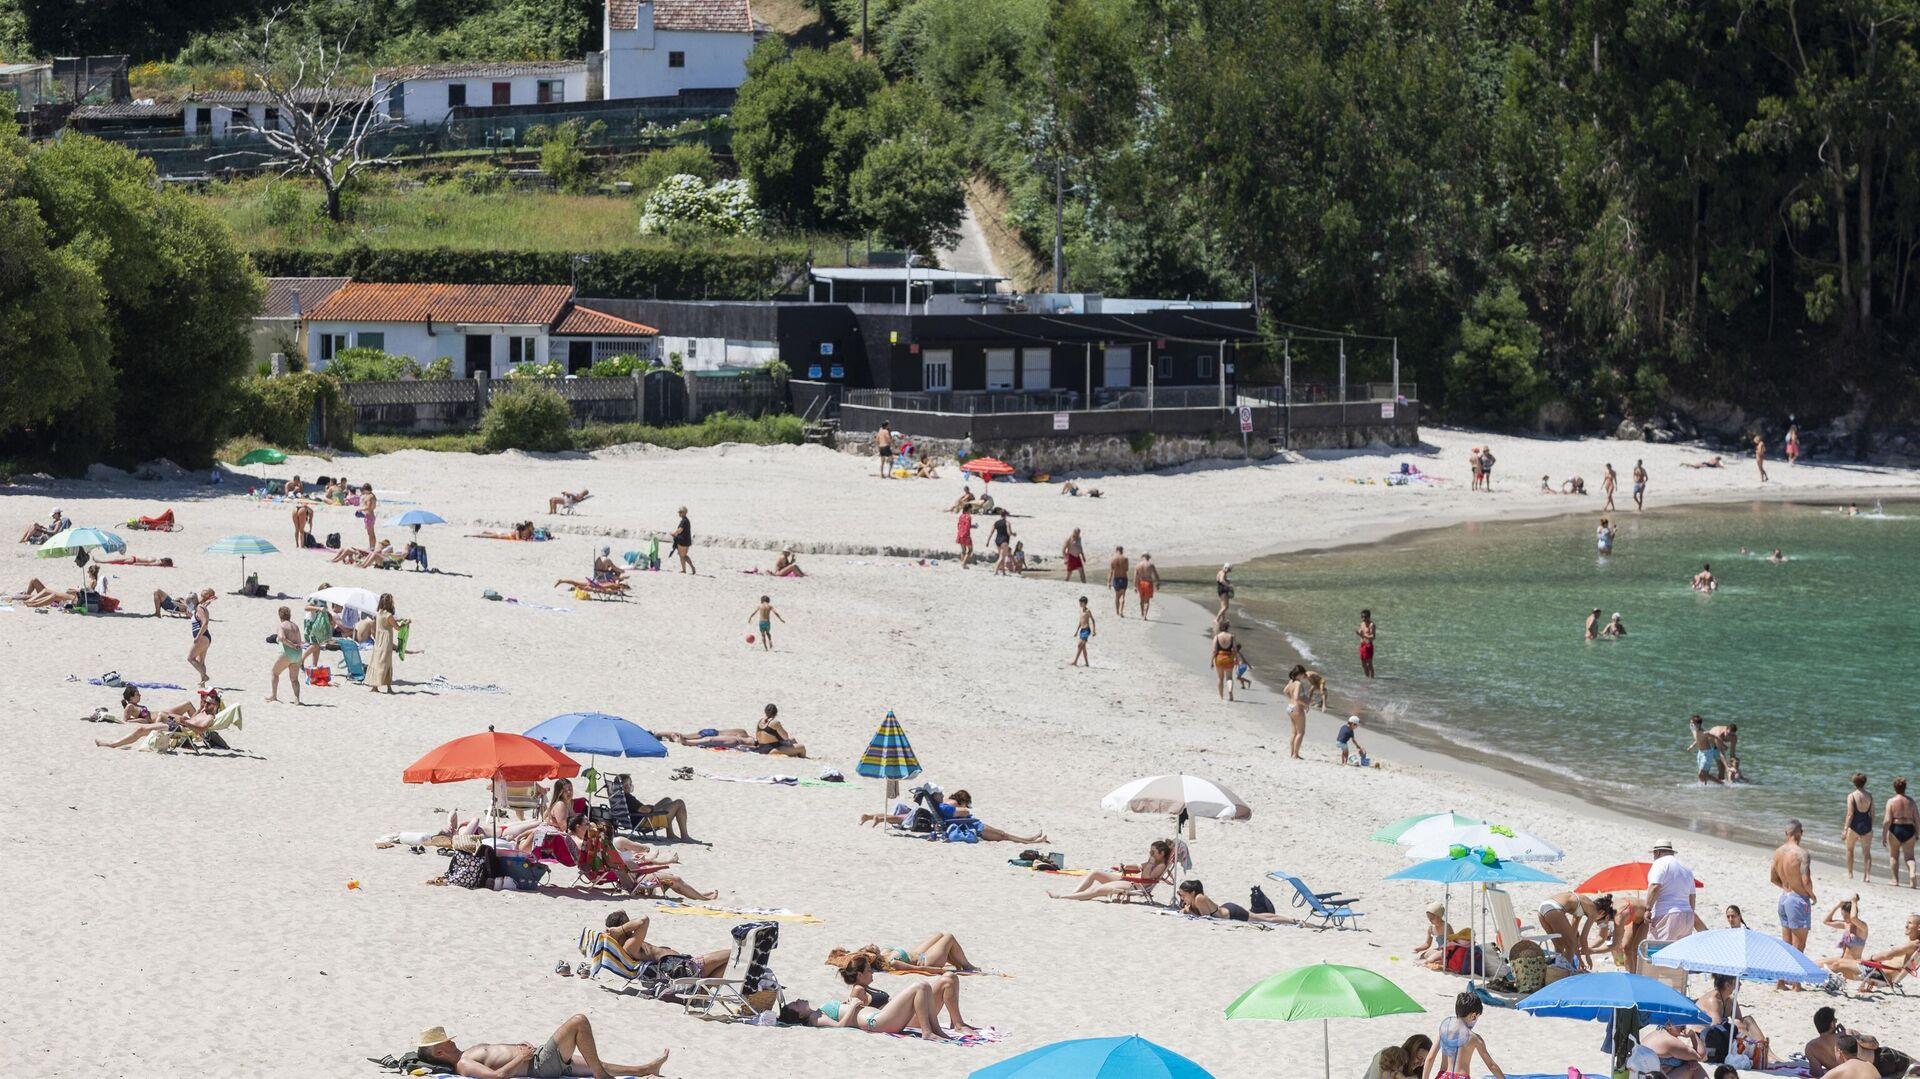 Personas en la playa, en Marín (Pontevedra) en junio 2021 - Sputnik Mundo, 1920, 09.06.2021